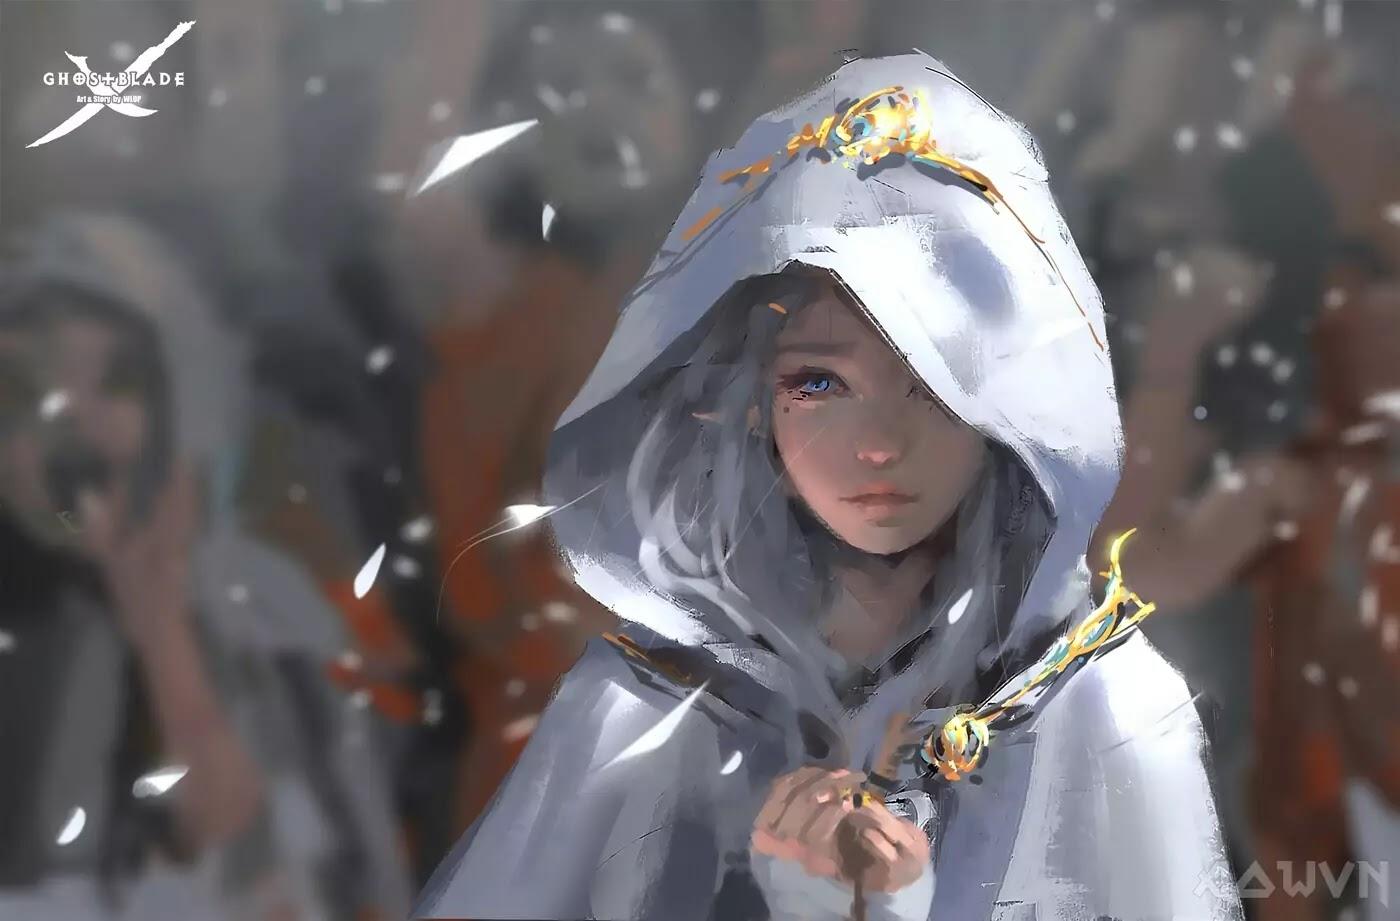 32 AowVN.org m - [ Hình Nền ] Anime Cực Đẹp by Wlop | Wallpaper Premium / Update